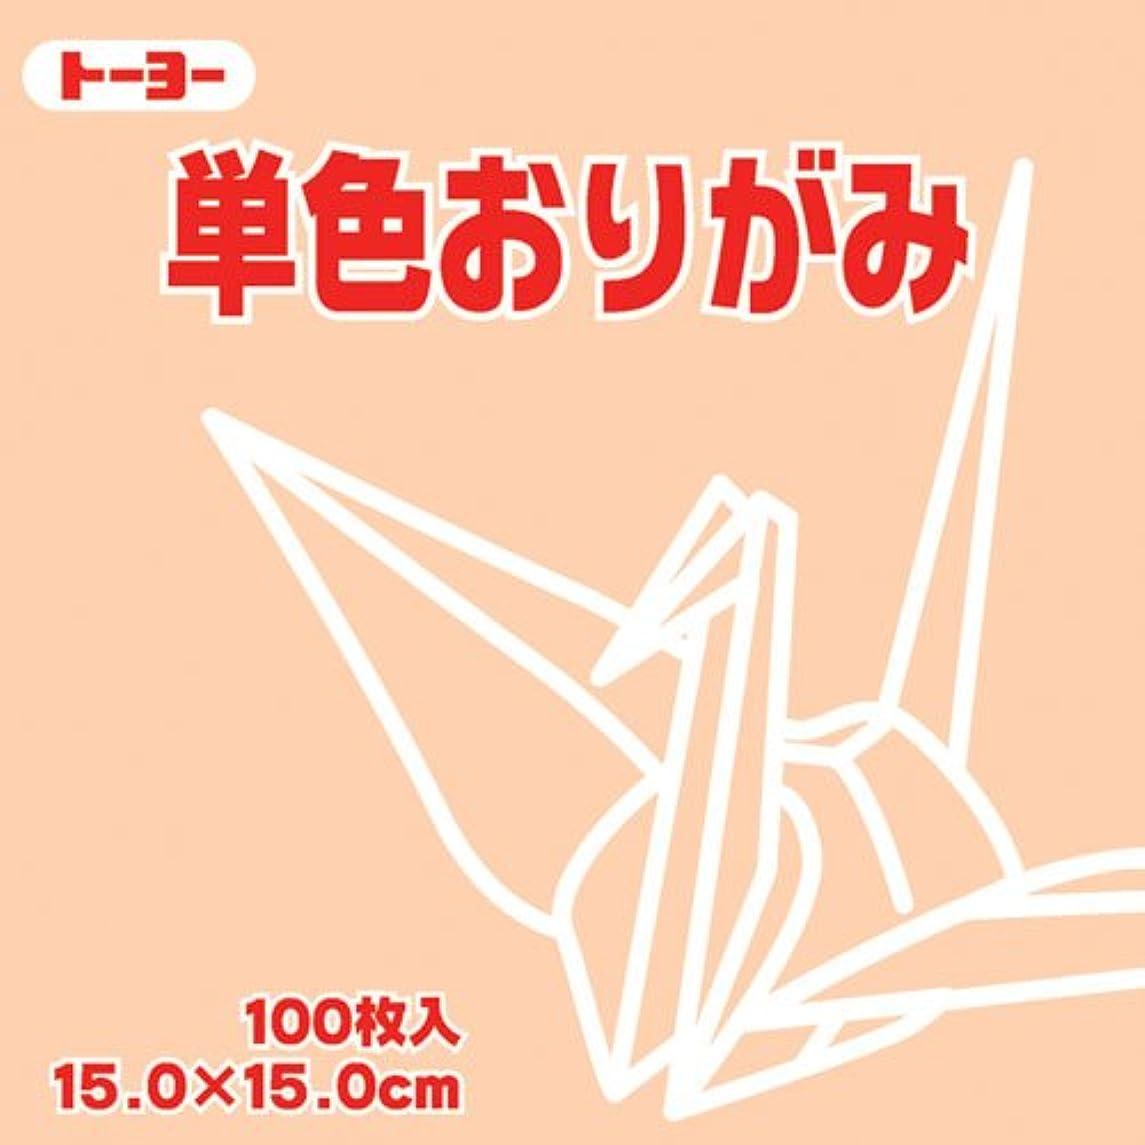 Toyo Origami Paper Single Color - Beige - 15cm, 100 Sheets